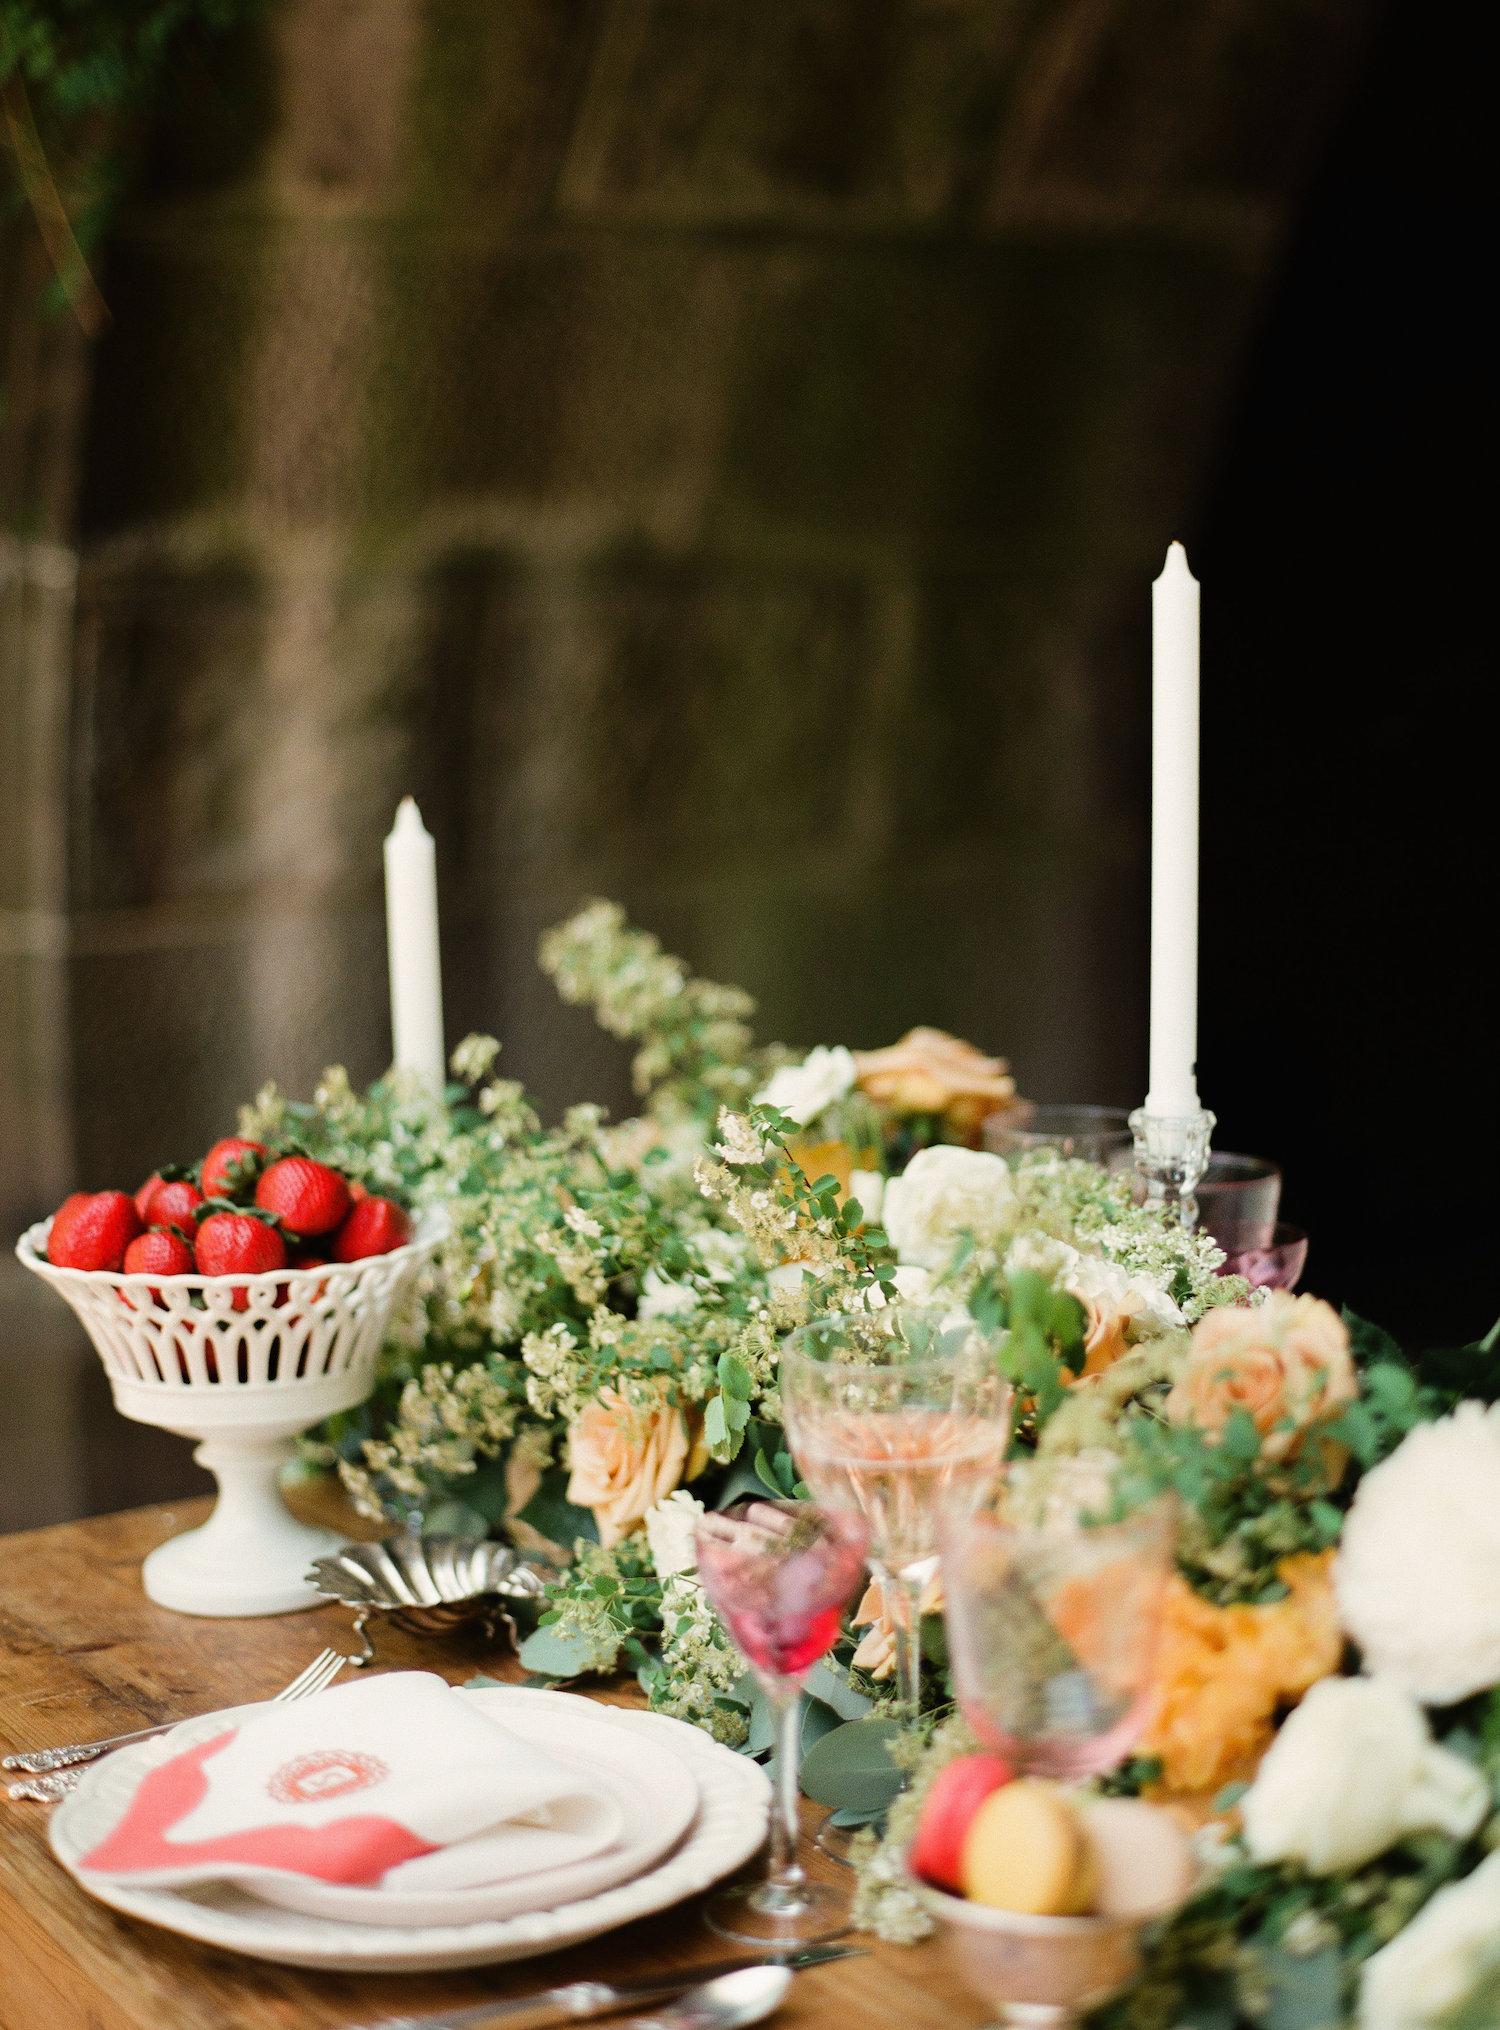 Morning Glow - Full Aperture Floral & Lindsay Madden Photography 79.jpeg